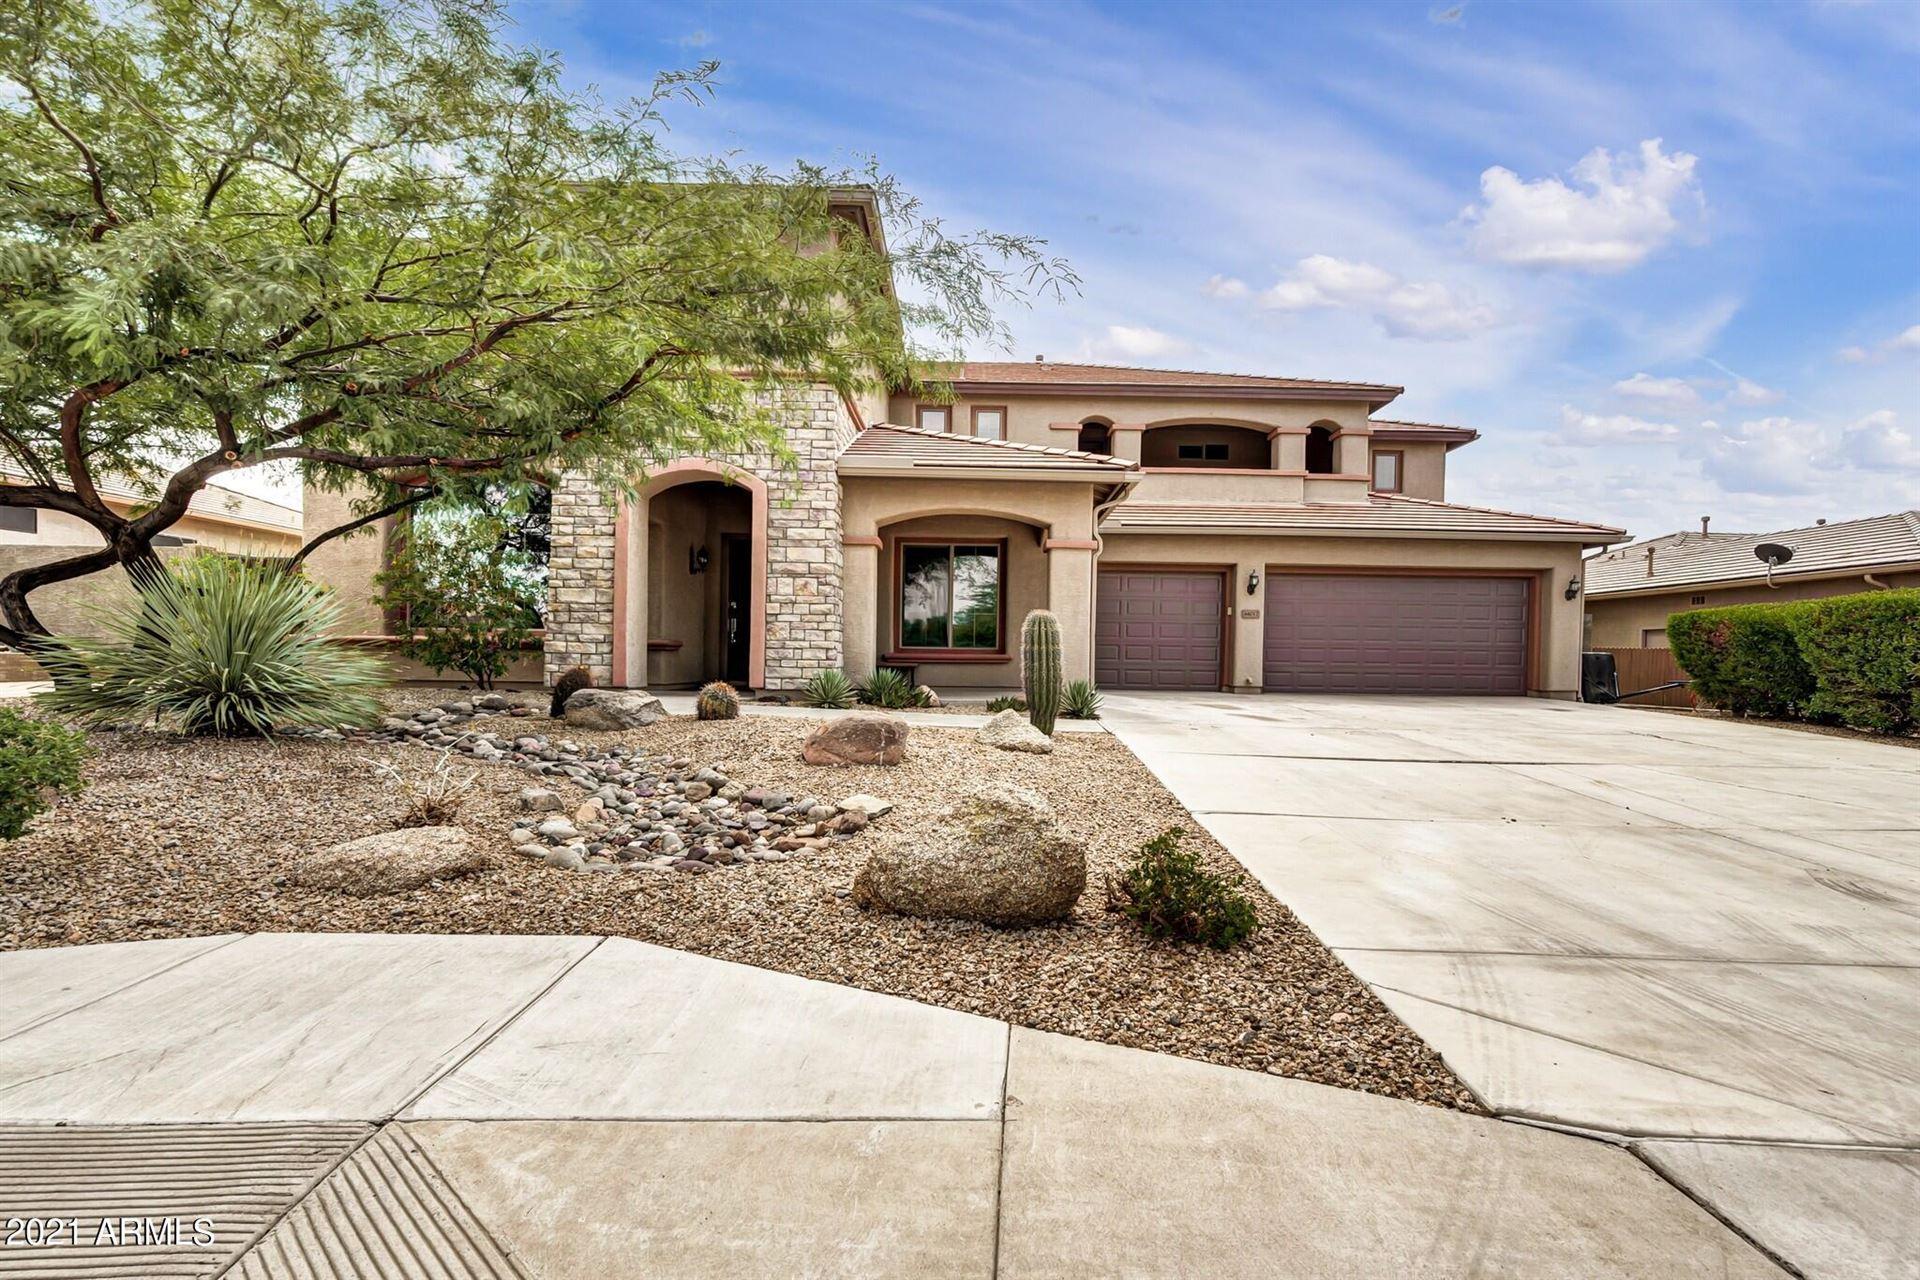 Photo of 44017 N 50TH Avenue, New River, AZ 85087 (MLS # 6269181)